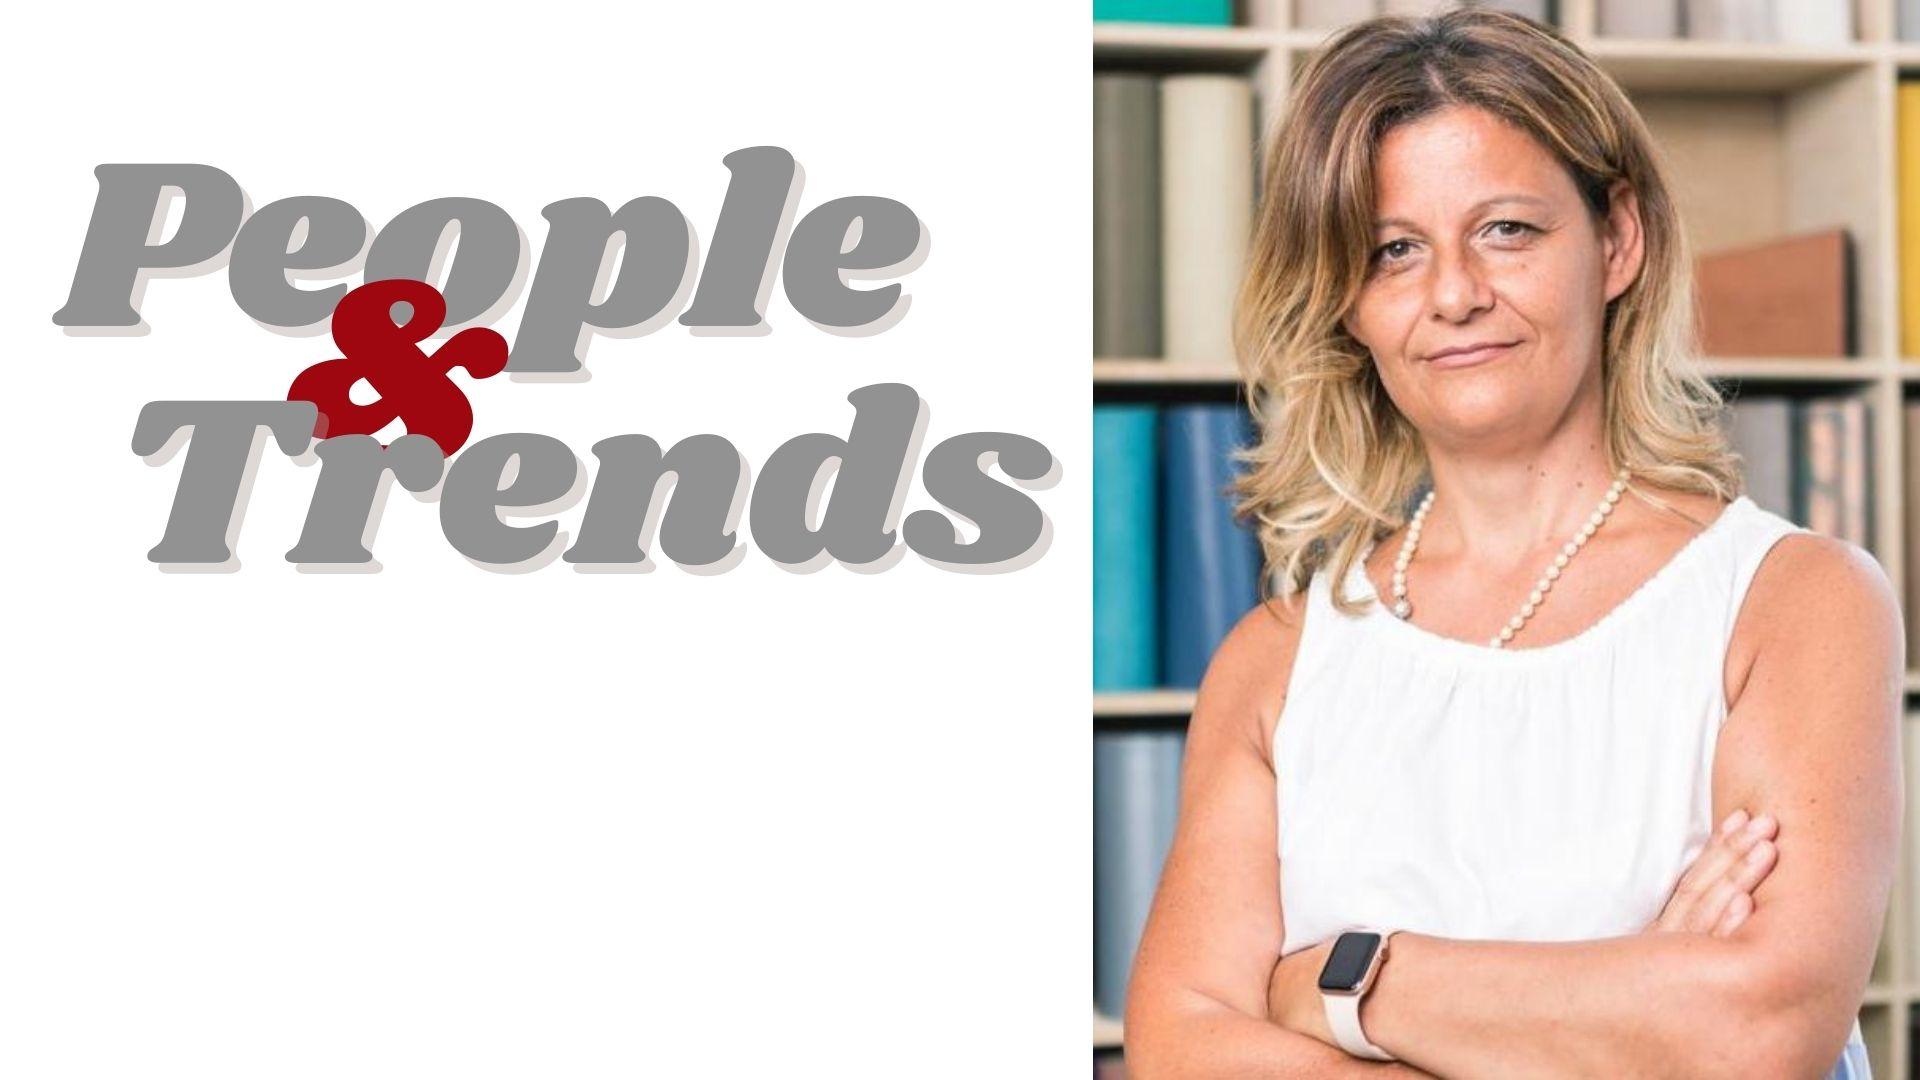 People & Trends - Intervista a Serena Bianchi